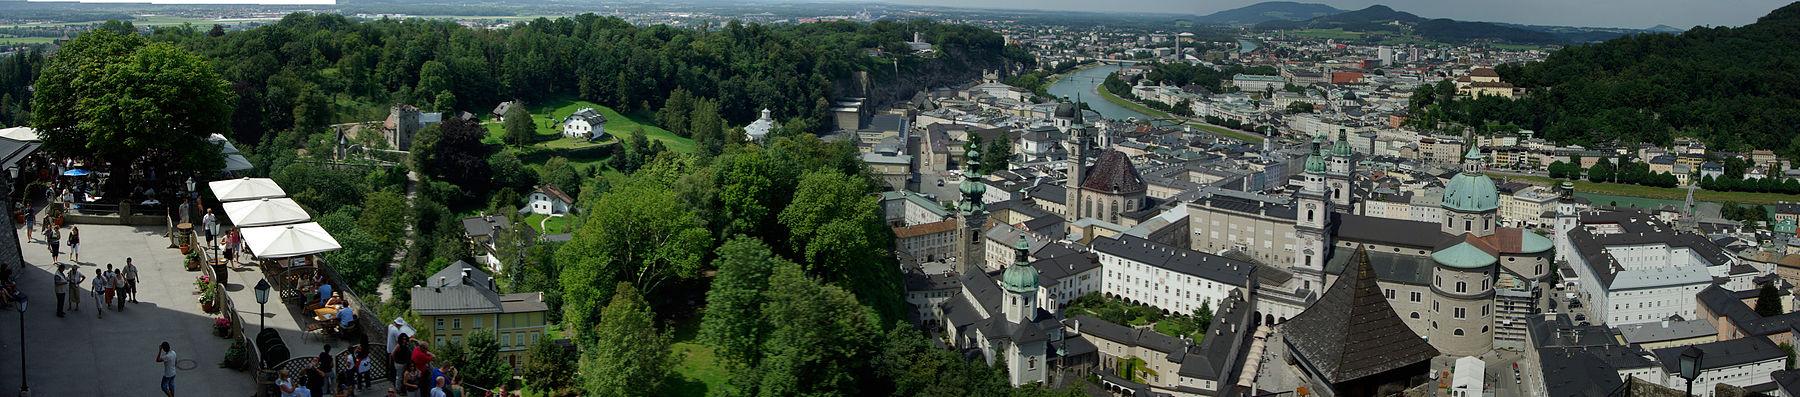 Panoramo de Salzburg vidita el kastelo Hohensalzburg